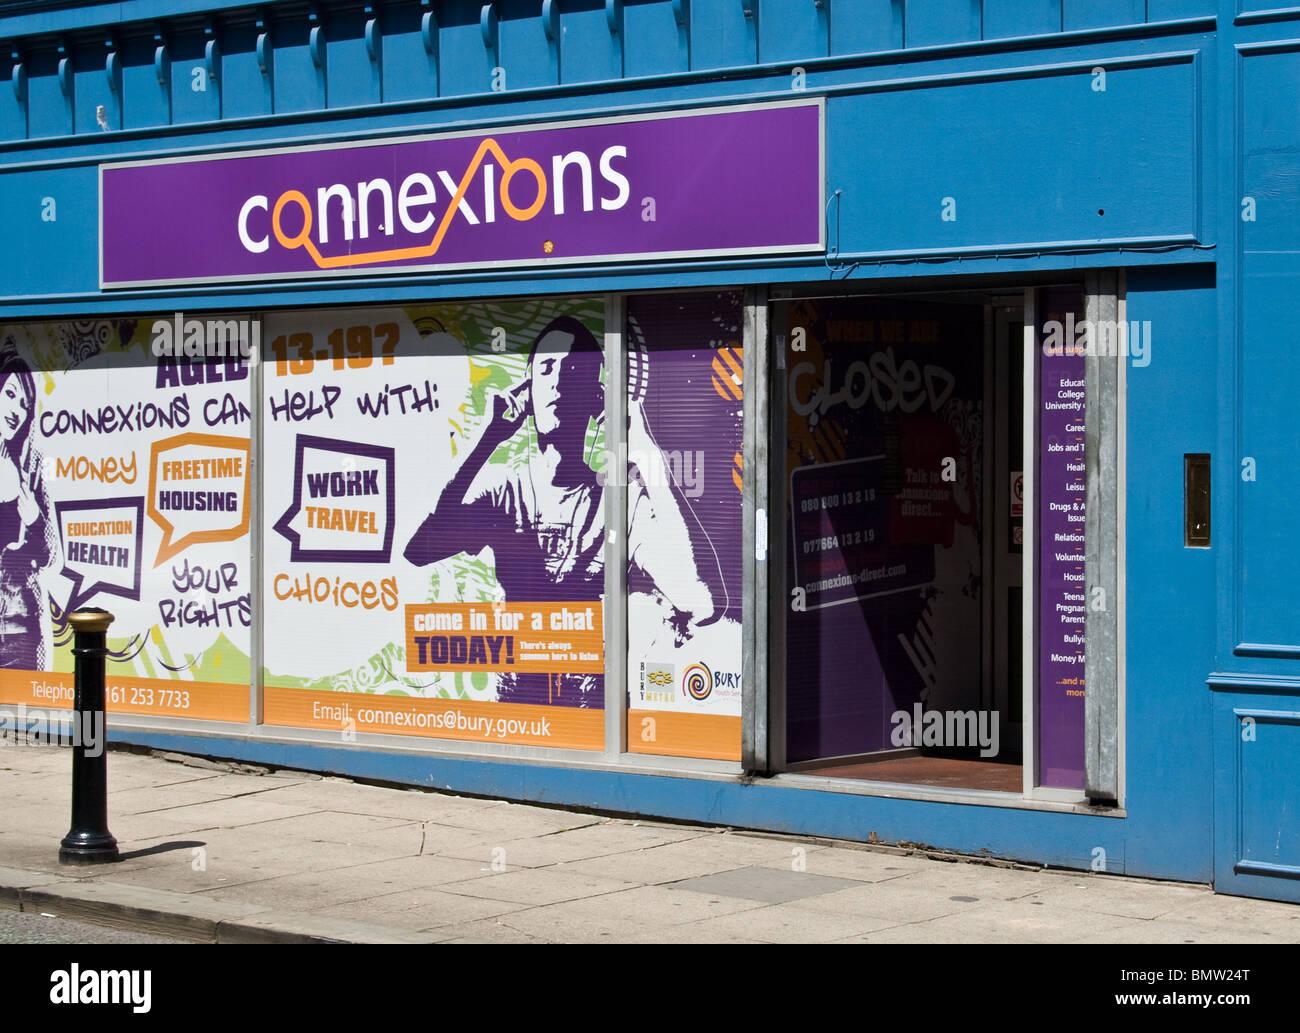 Connexions (Jugend-Betreuung), Stadtzentrum, Bury, größere Manchester, UK Stockbild